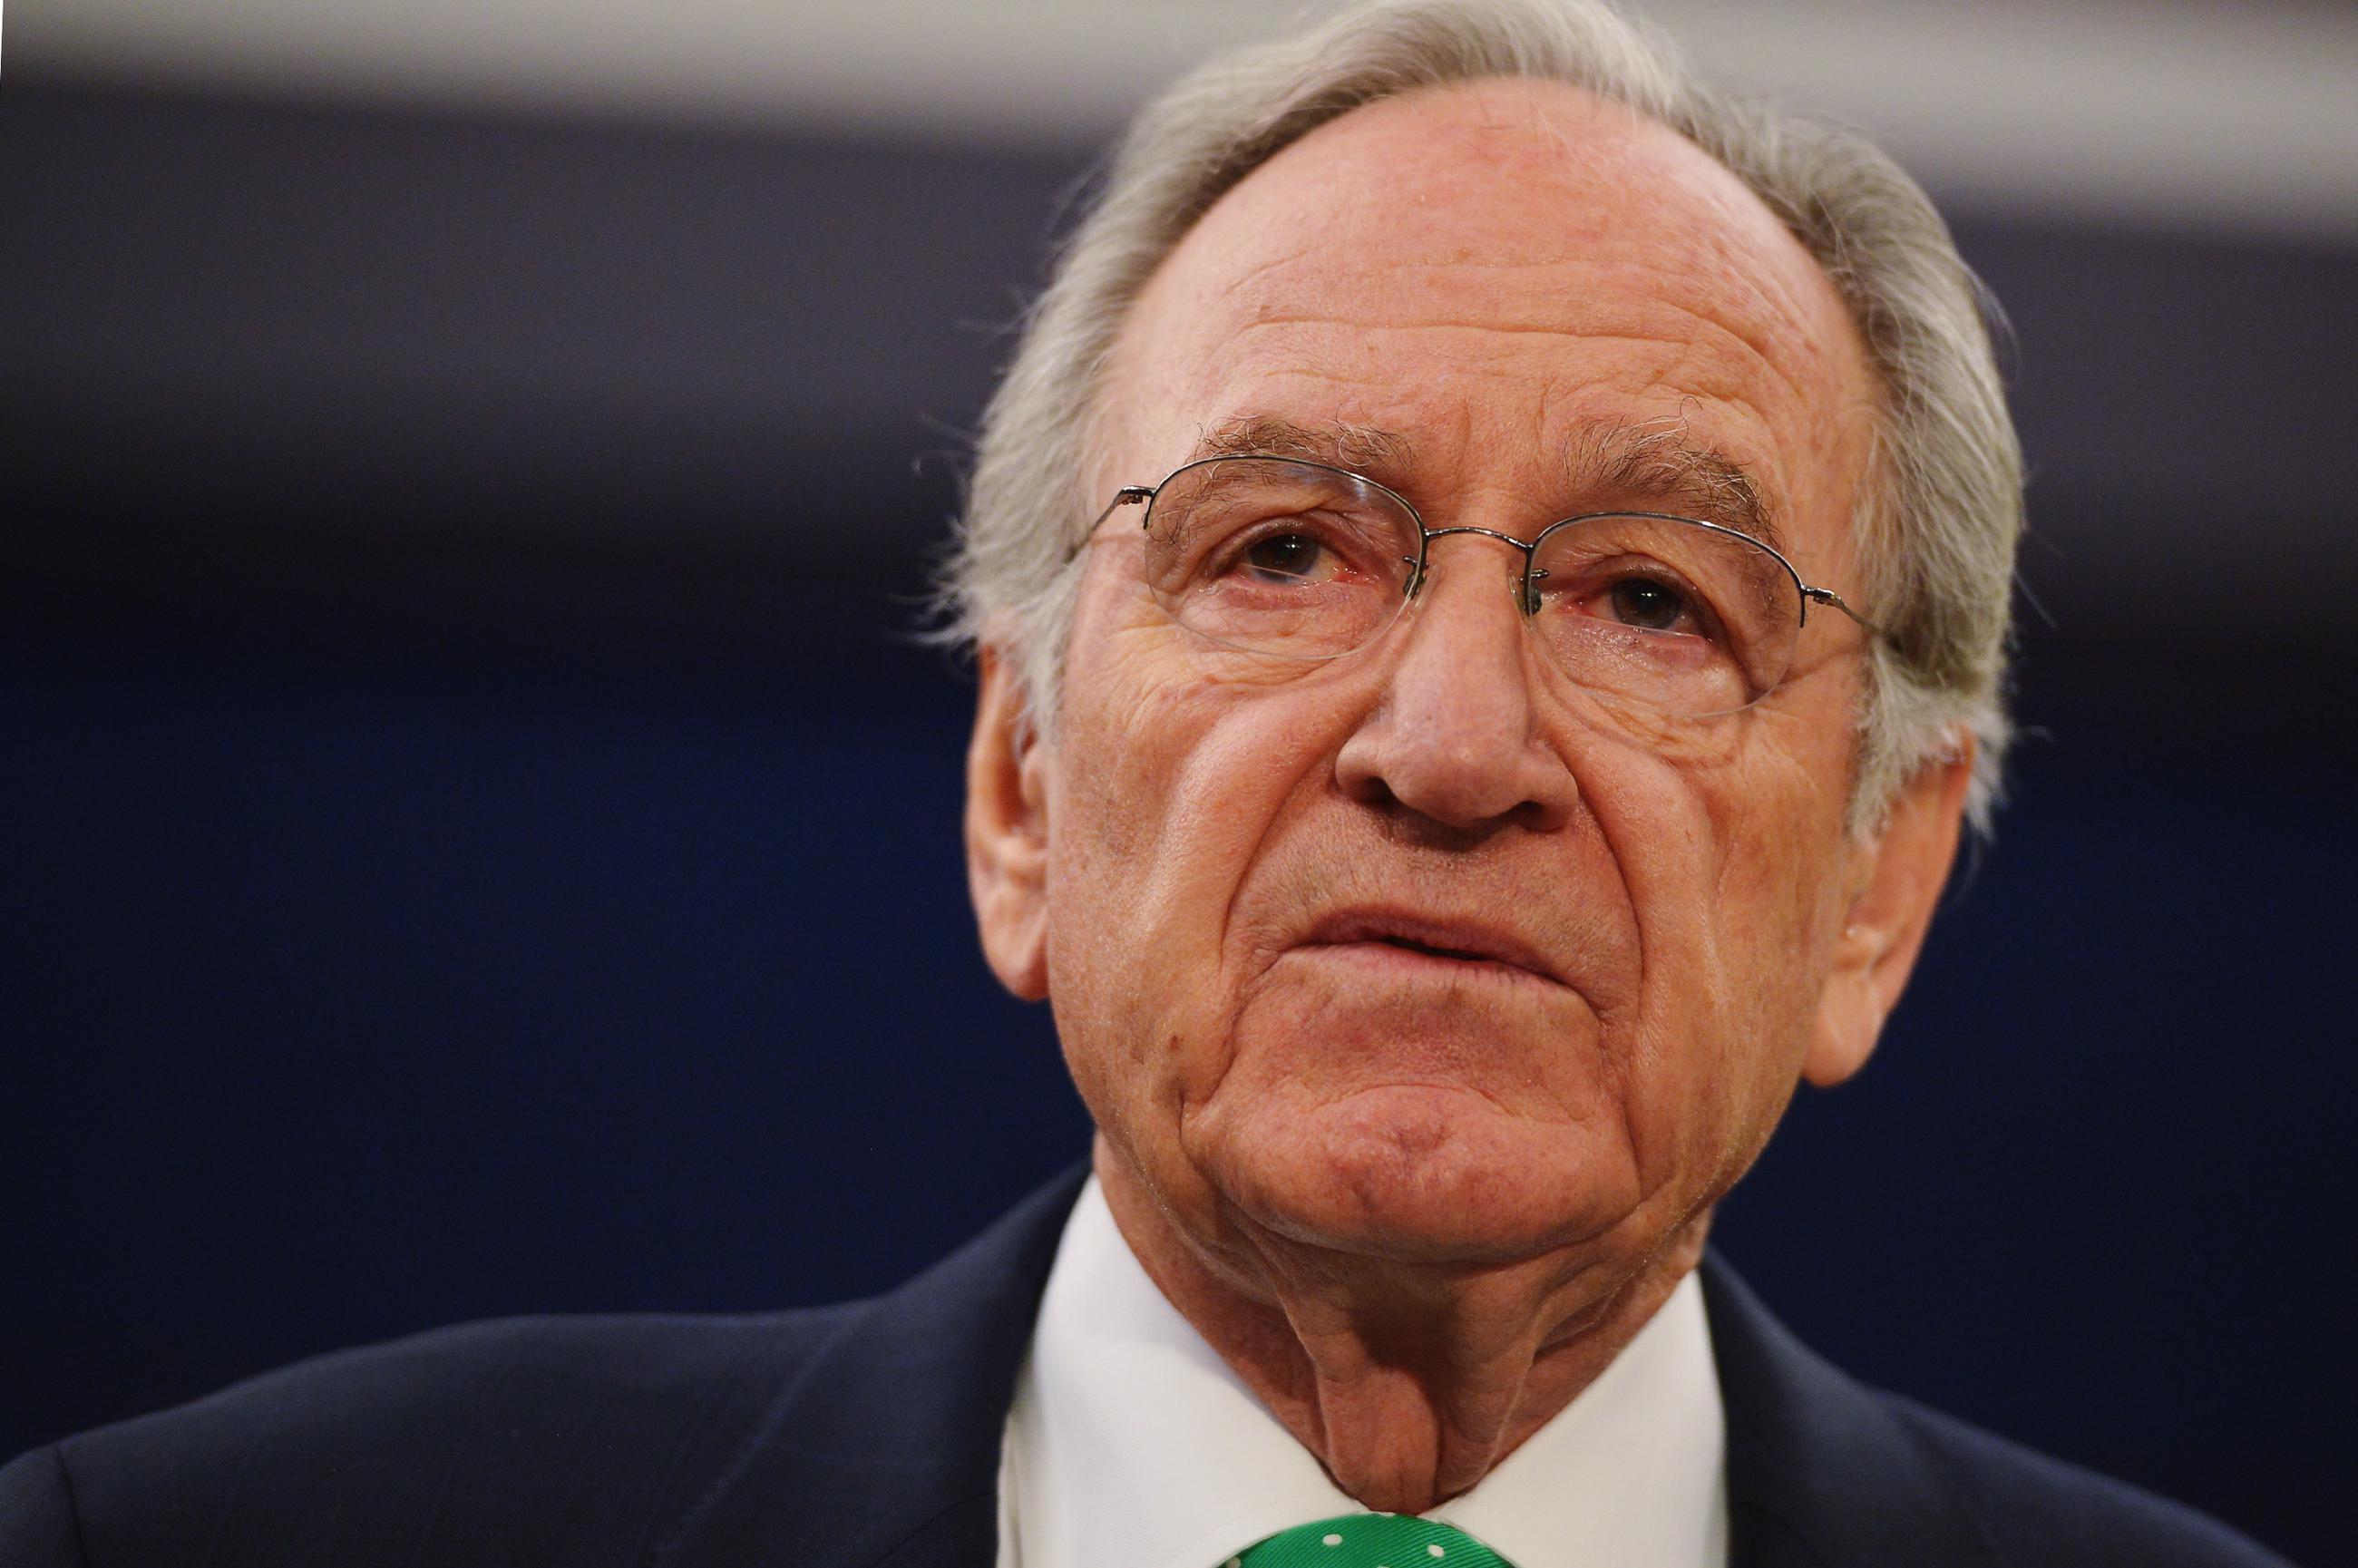 Democrats Bypass Committee on Minimum-Wage Bill to Limit 'Embarrassing' GOP Amendments